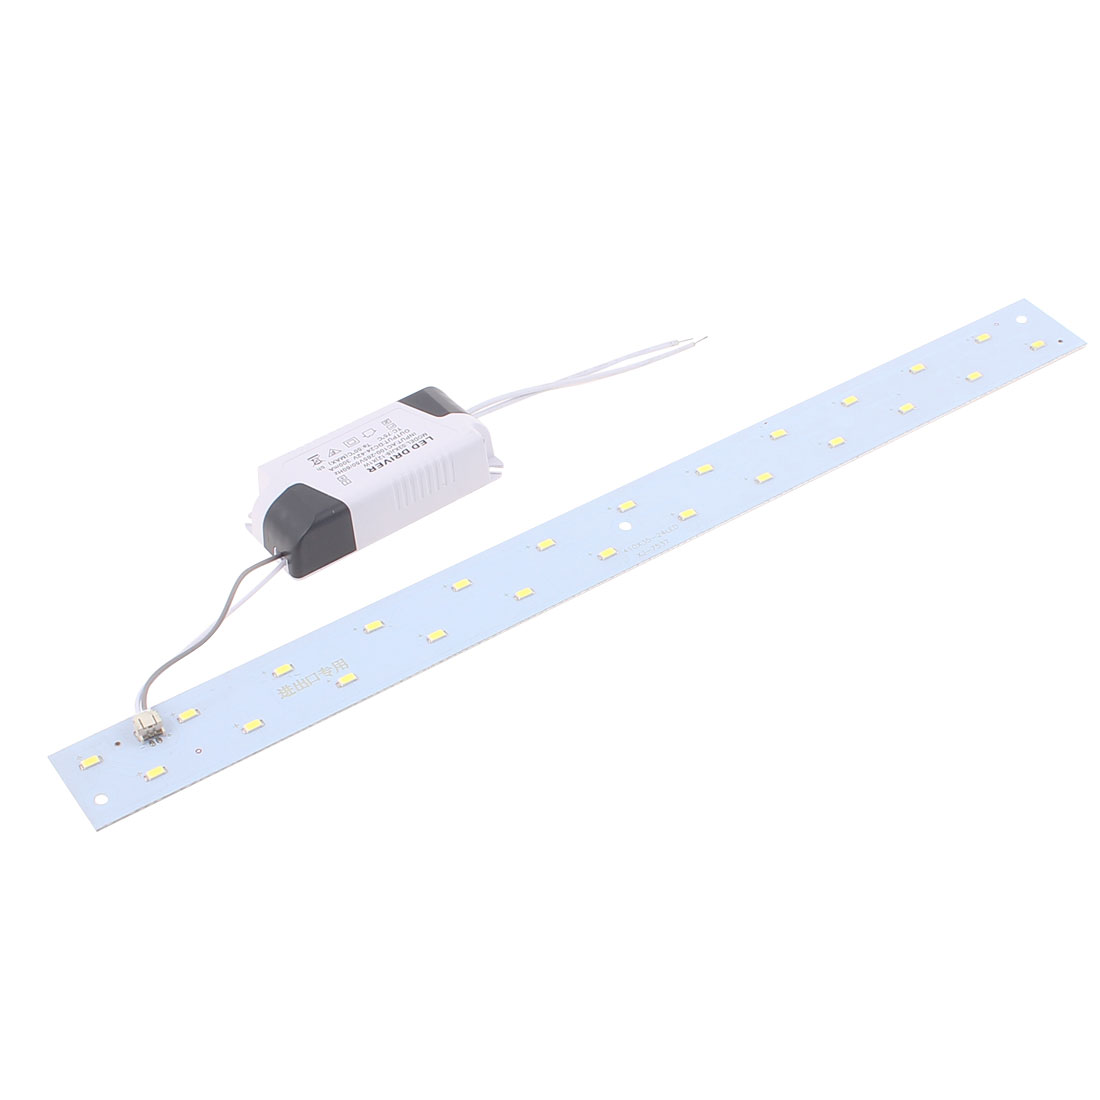 AC100~265V 12W LED Ceiling light Panel Long Strip Retrofit Plate Pure White 40cm